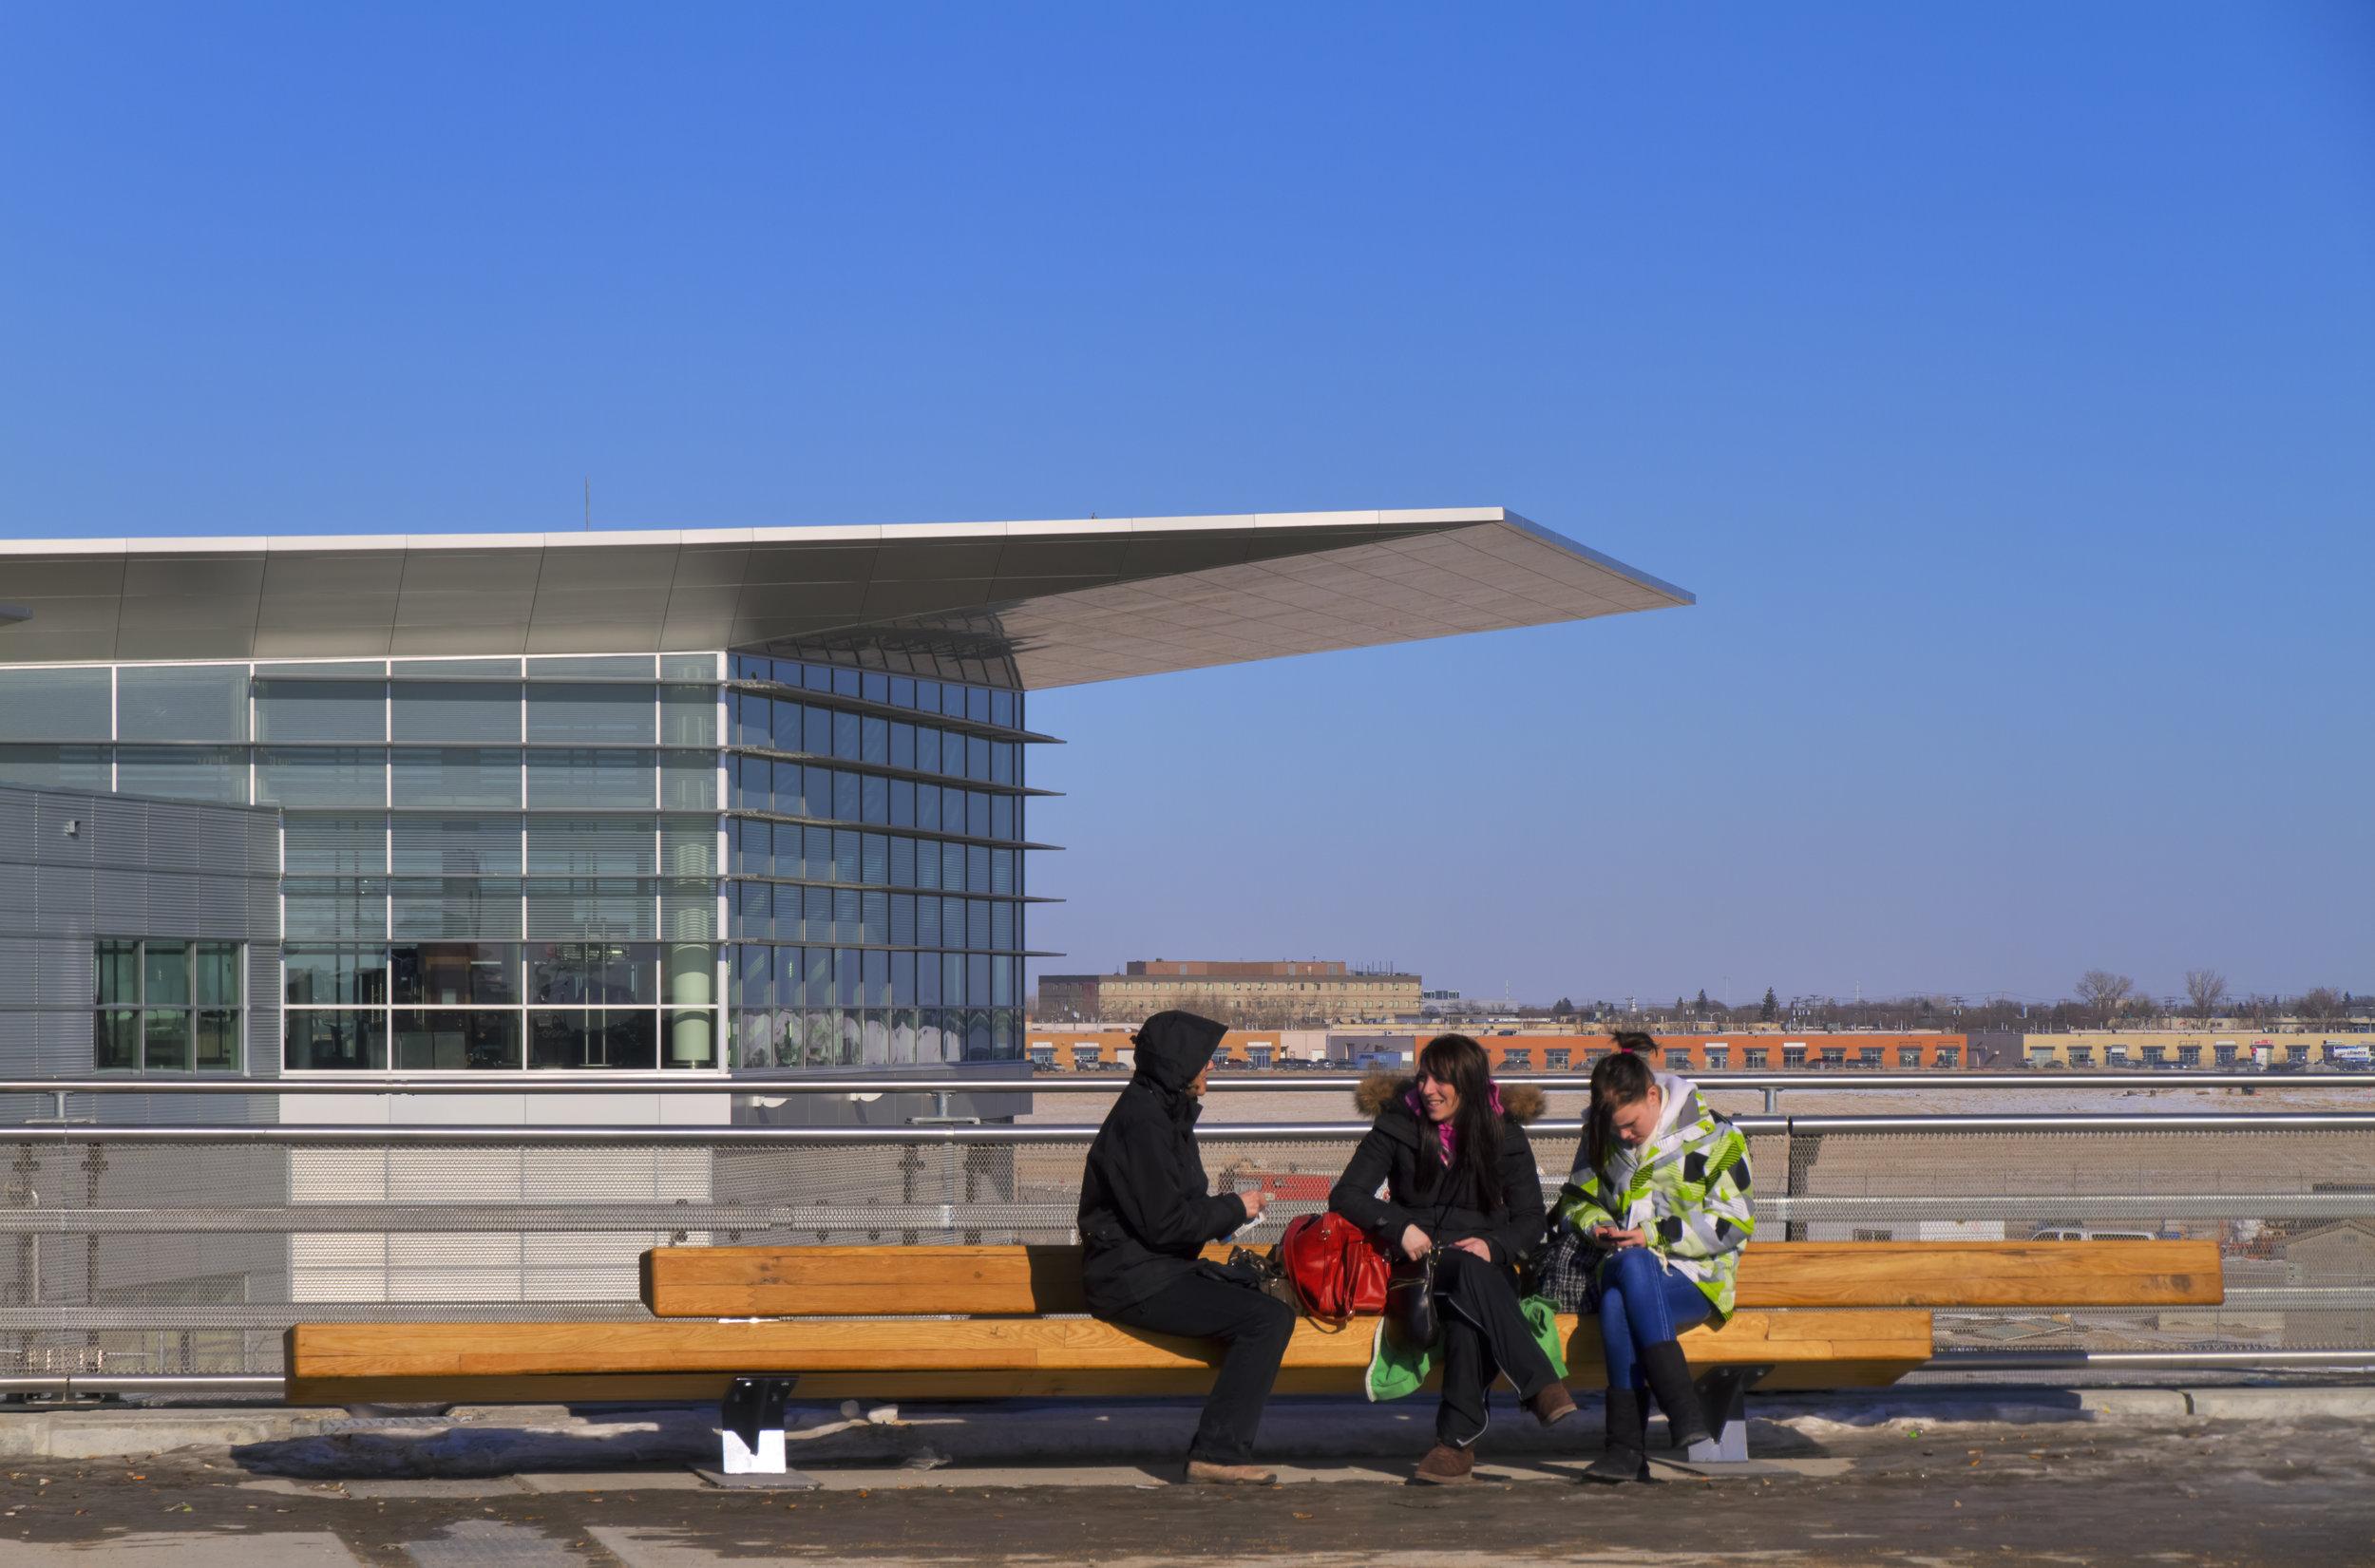 Video: Winnipeg Terminal